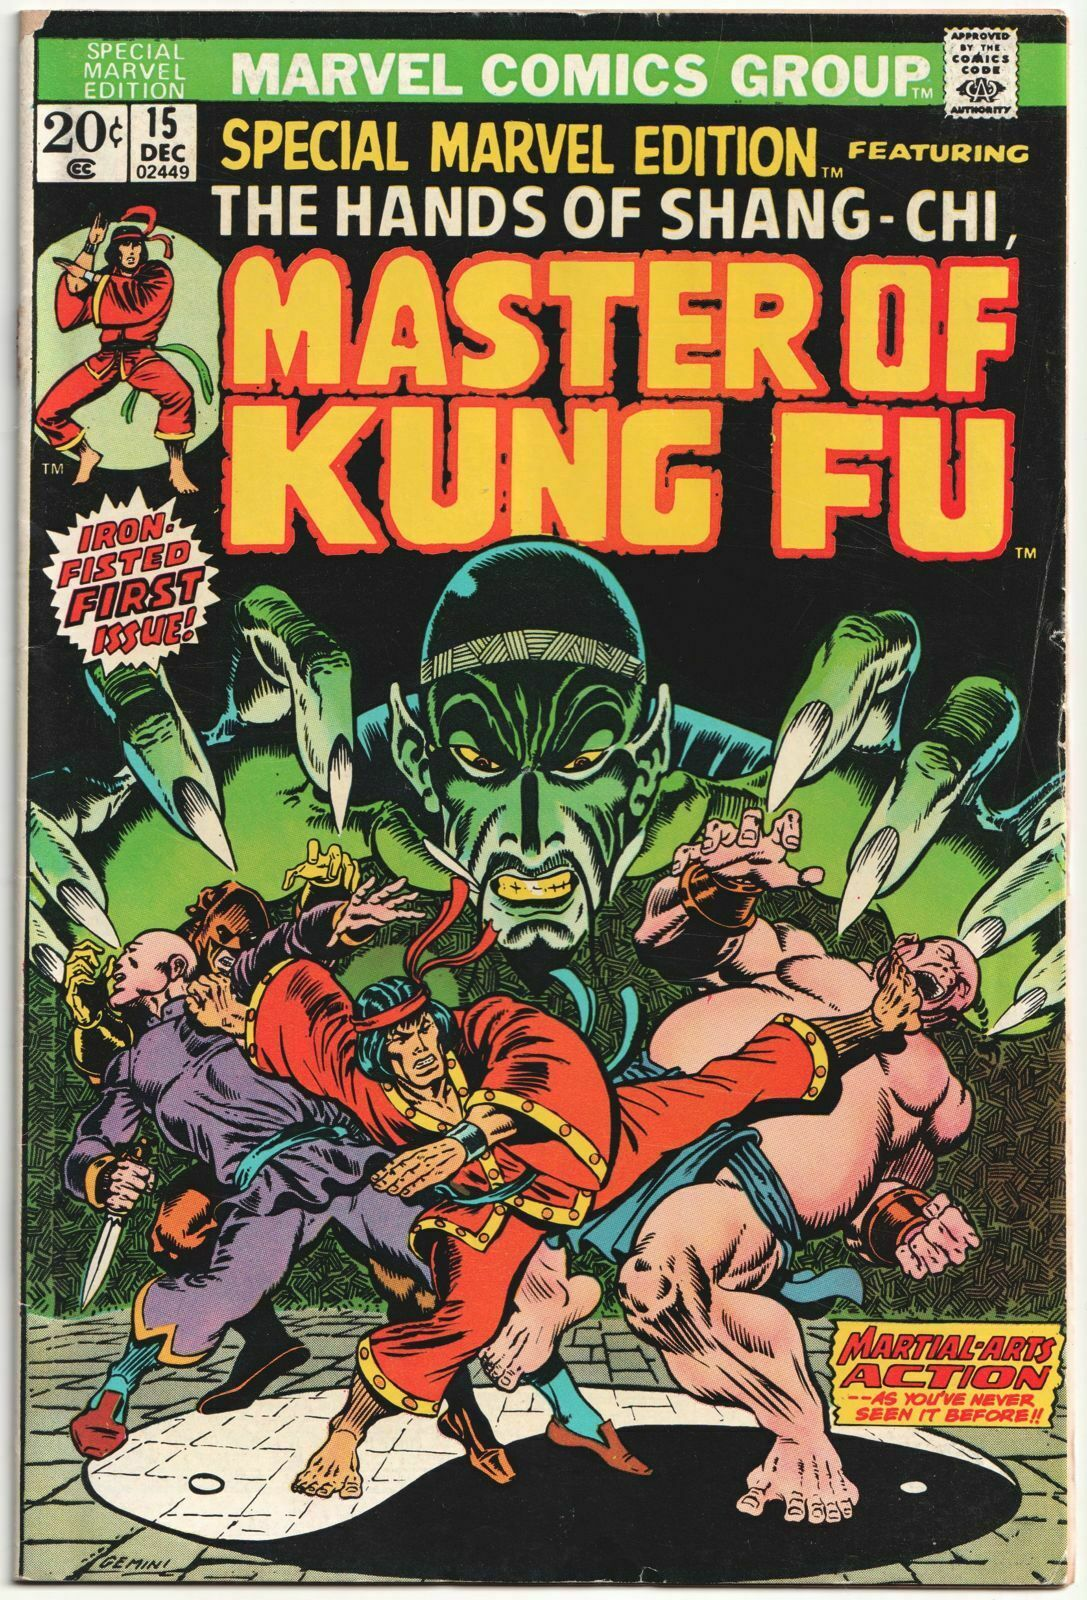 Image 1 - MARVEL SPECIAL EDITION #15 1ST APP SHANG CHI MASTER KUNG FU 1973 MOVIE COMICS